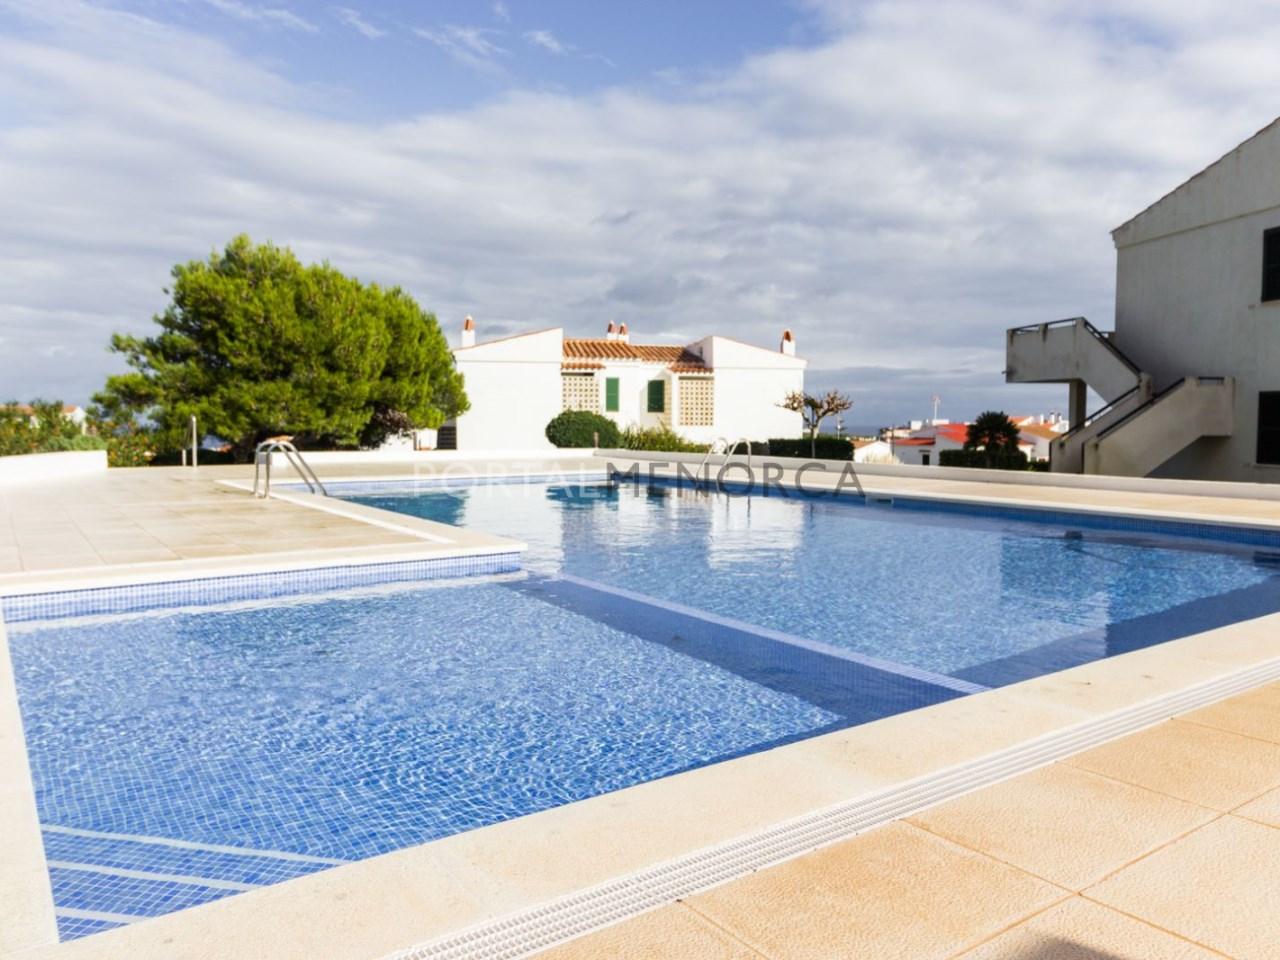 apartamento en venta en Arenal d'en Castell (13 de 14)